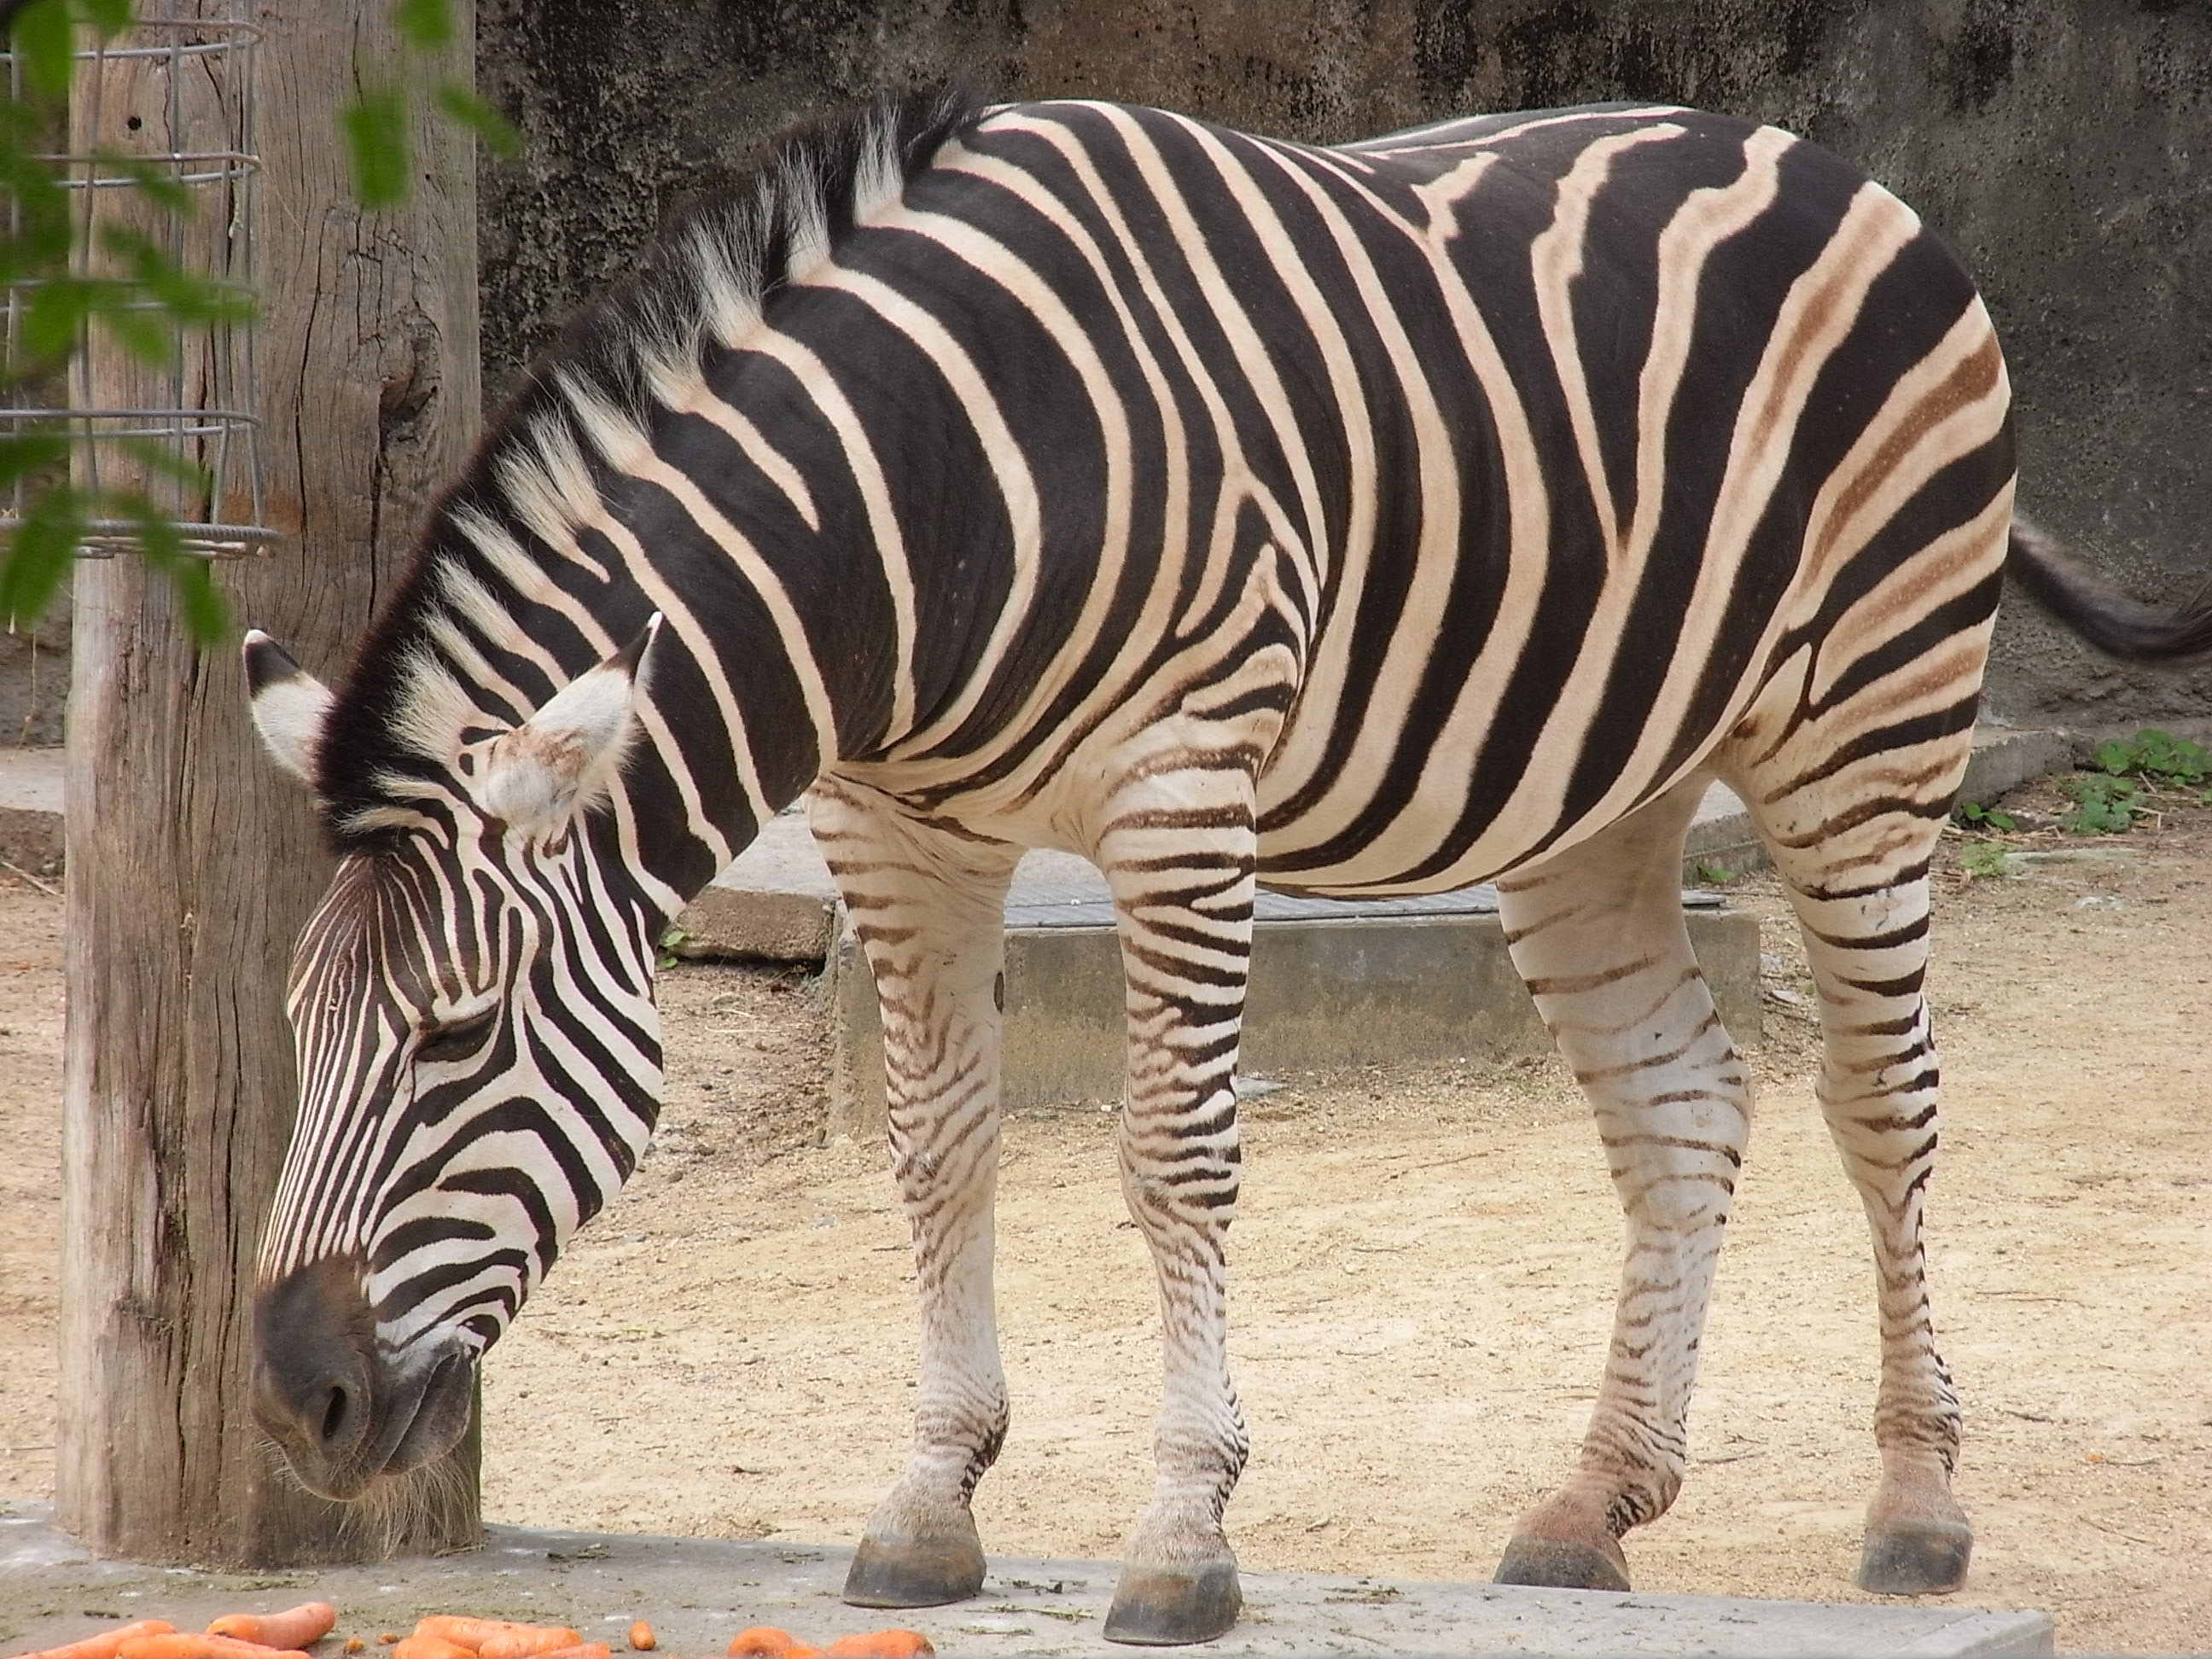 Zebra, Animal, Black, Equine, Horse, HQ Photo